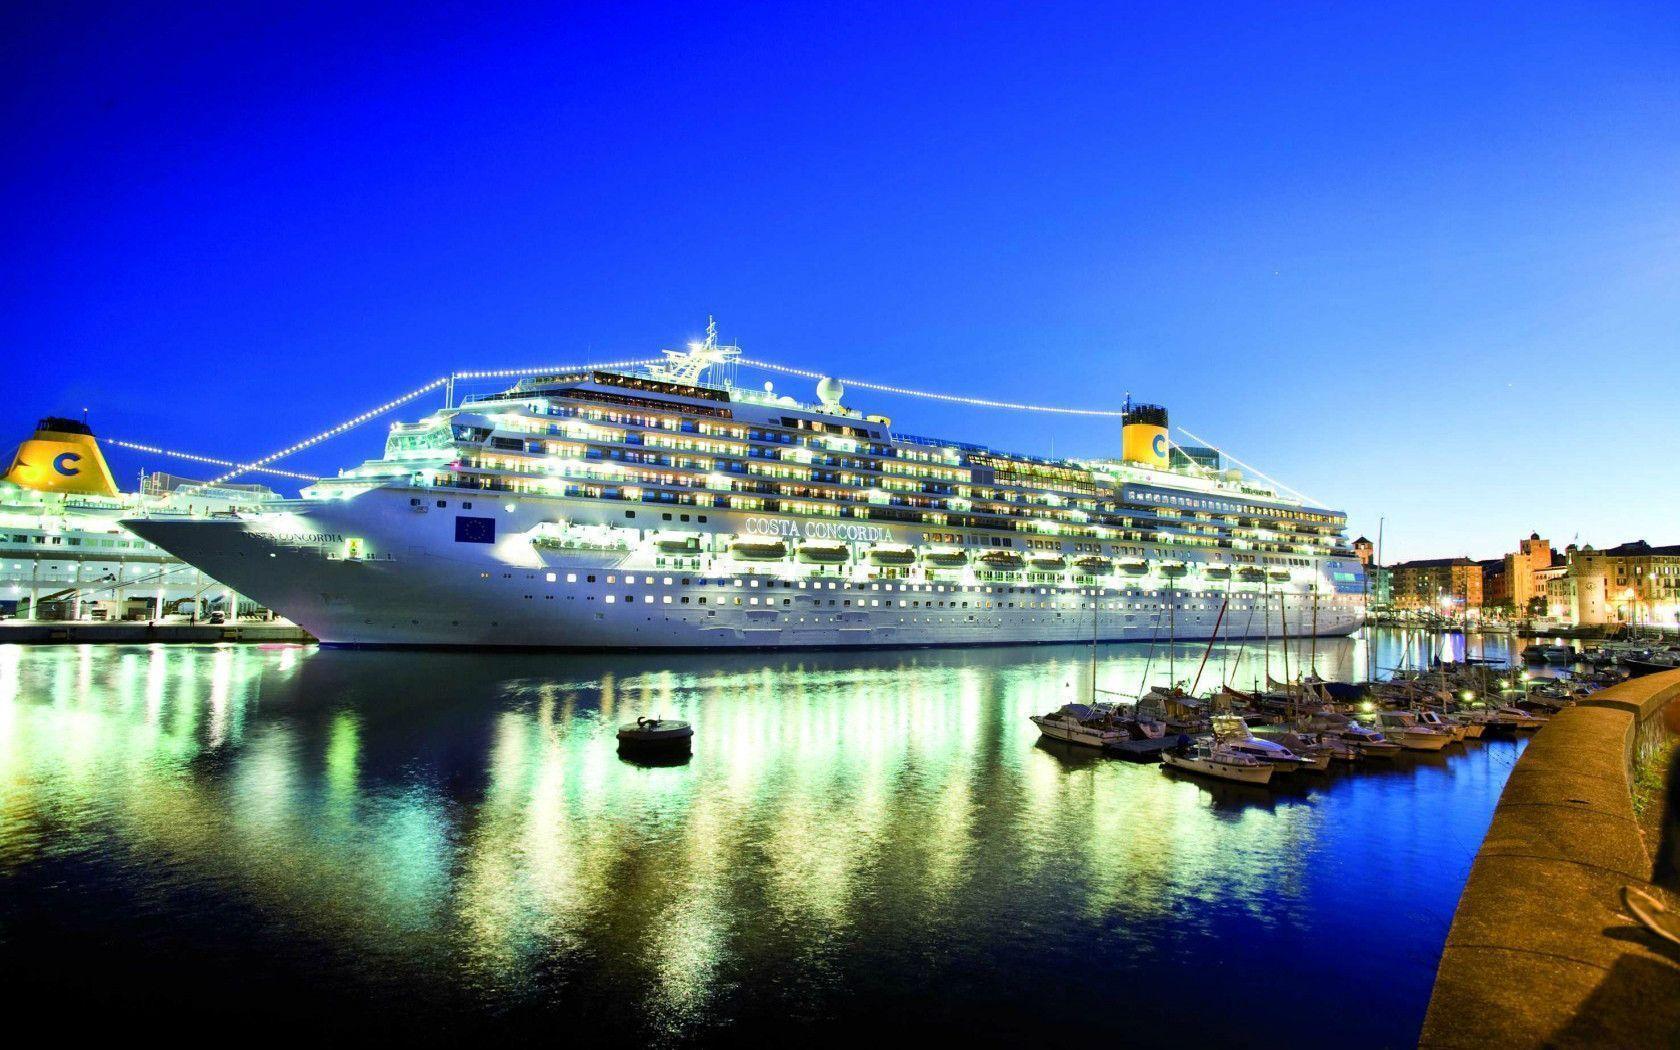 cruise ship wallpaper background - photo #39